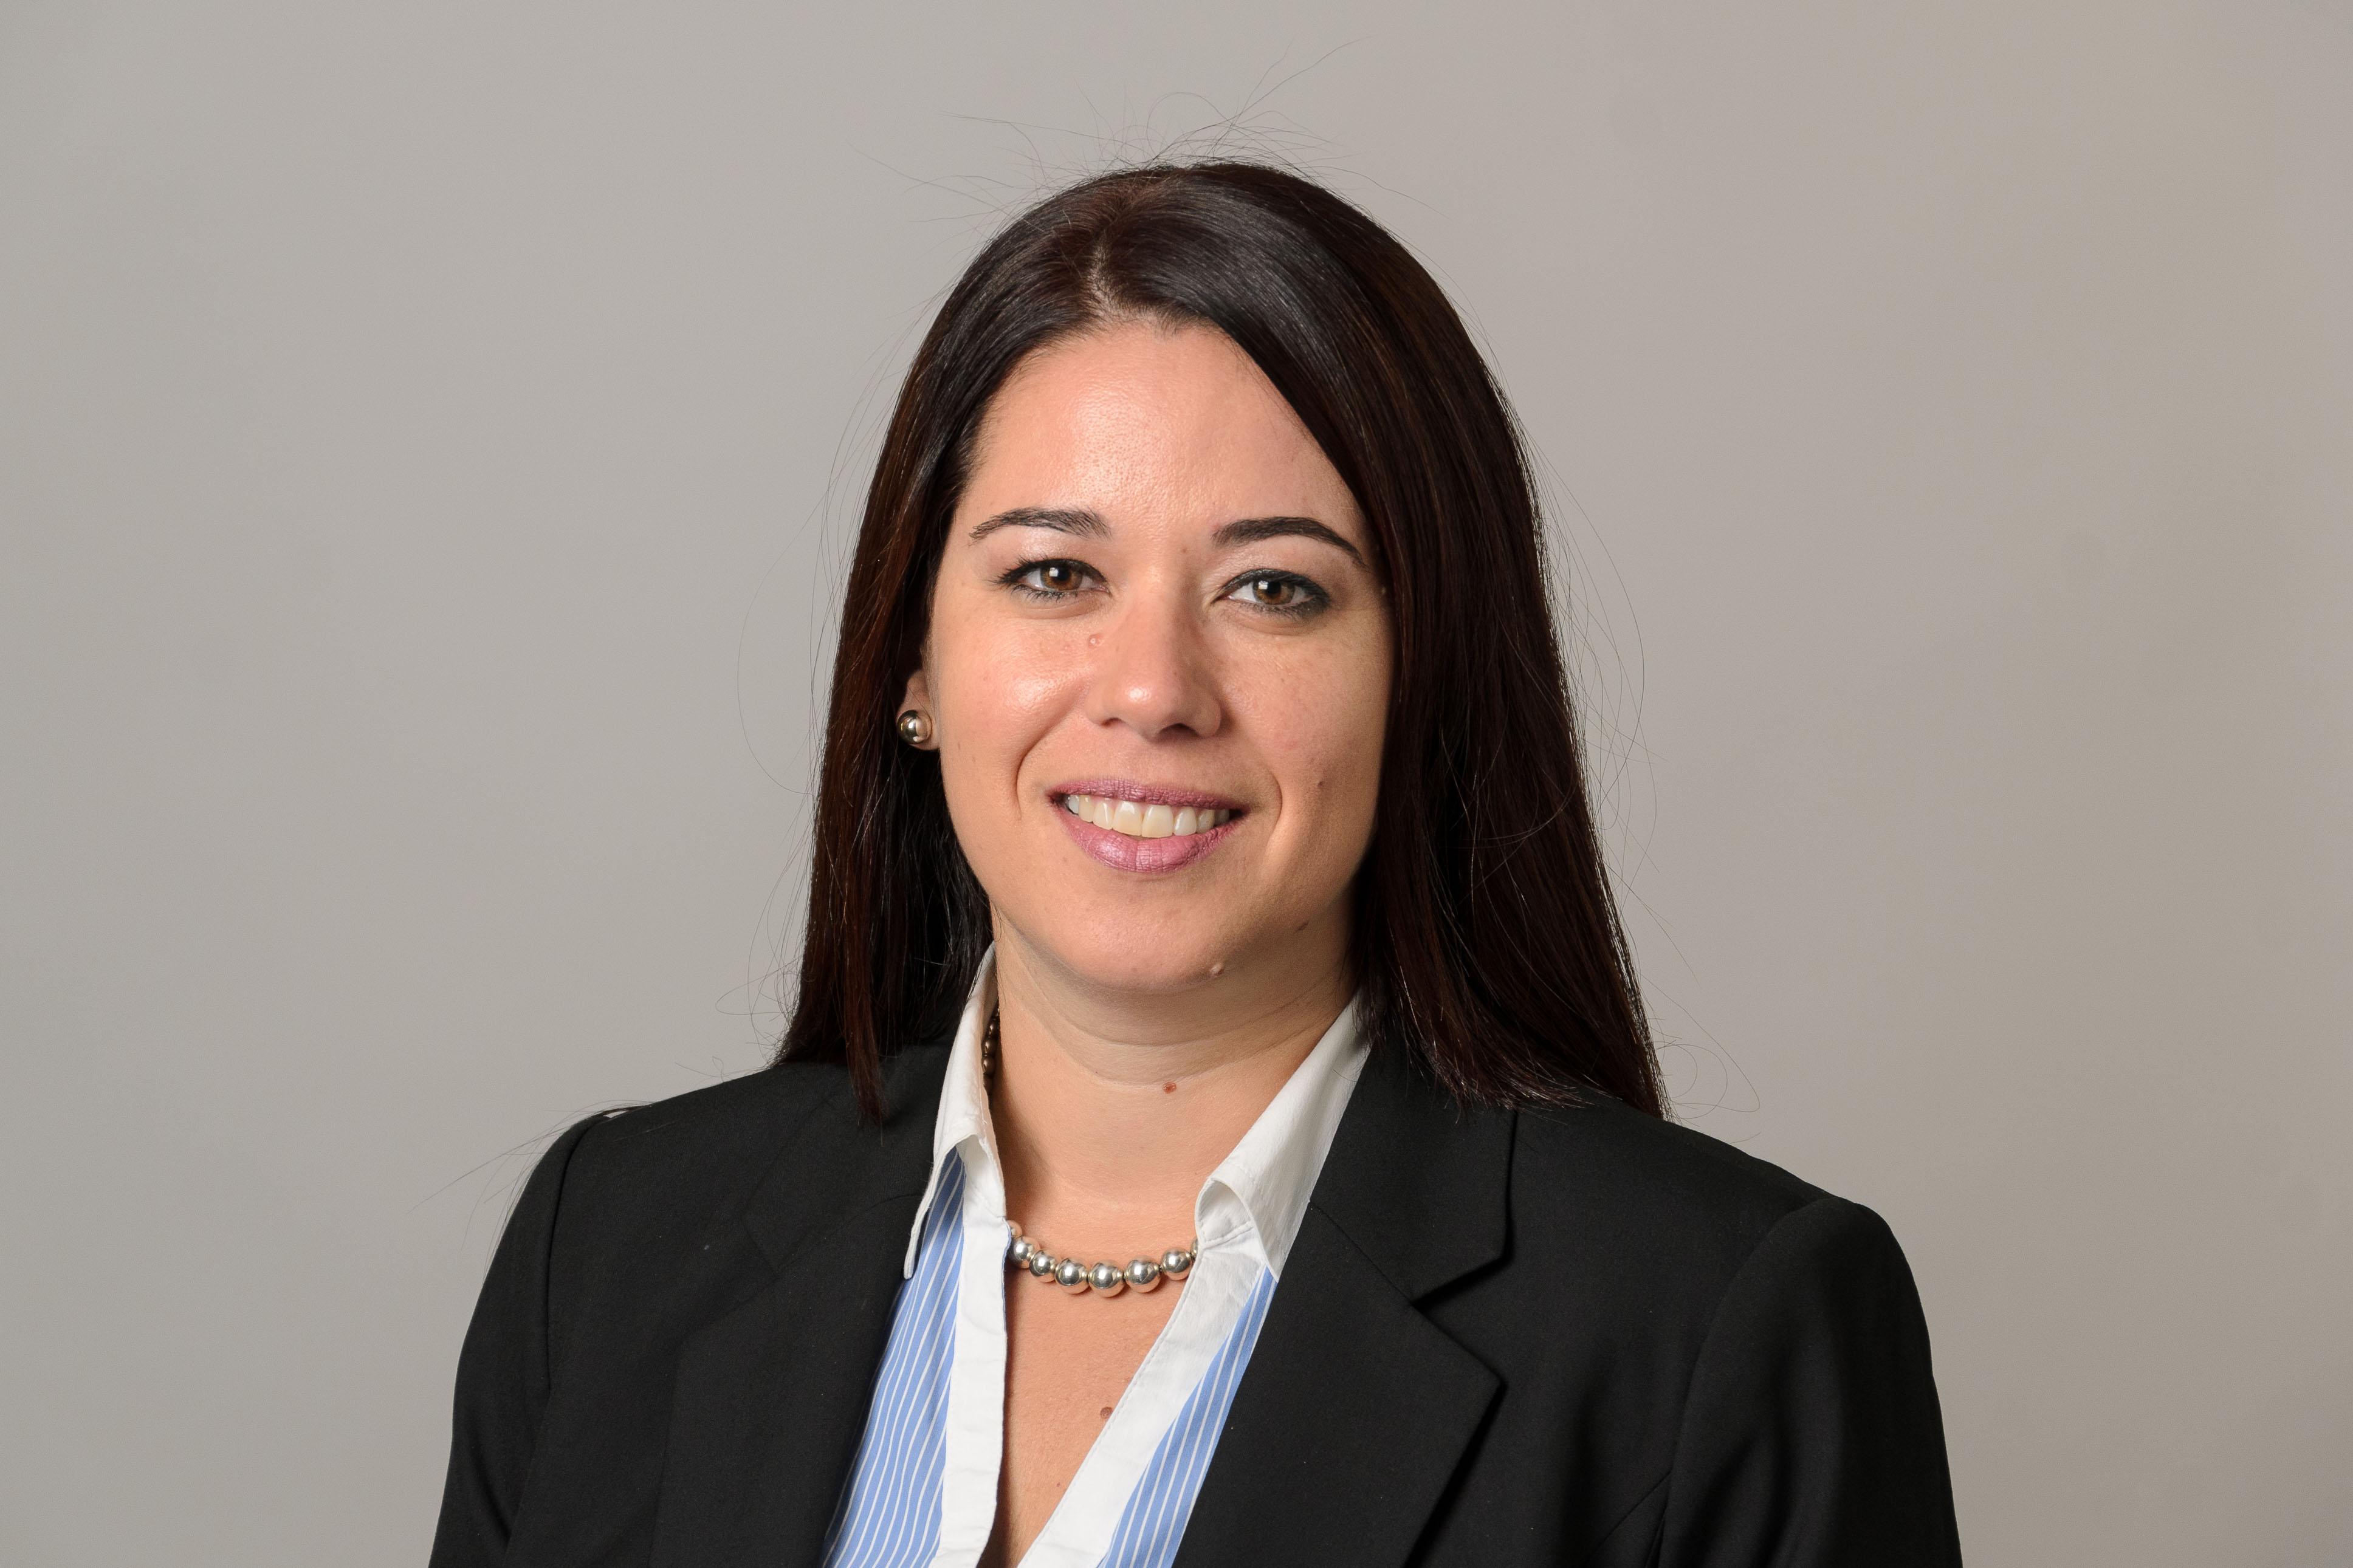 Priscilla Fretz